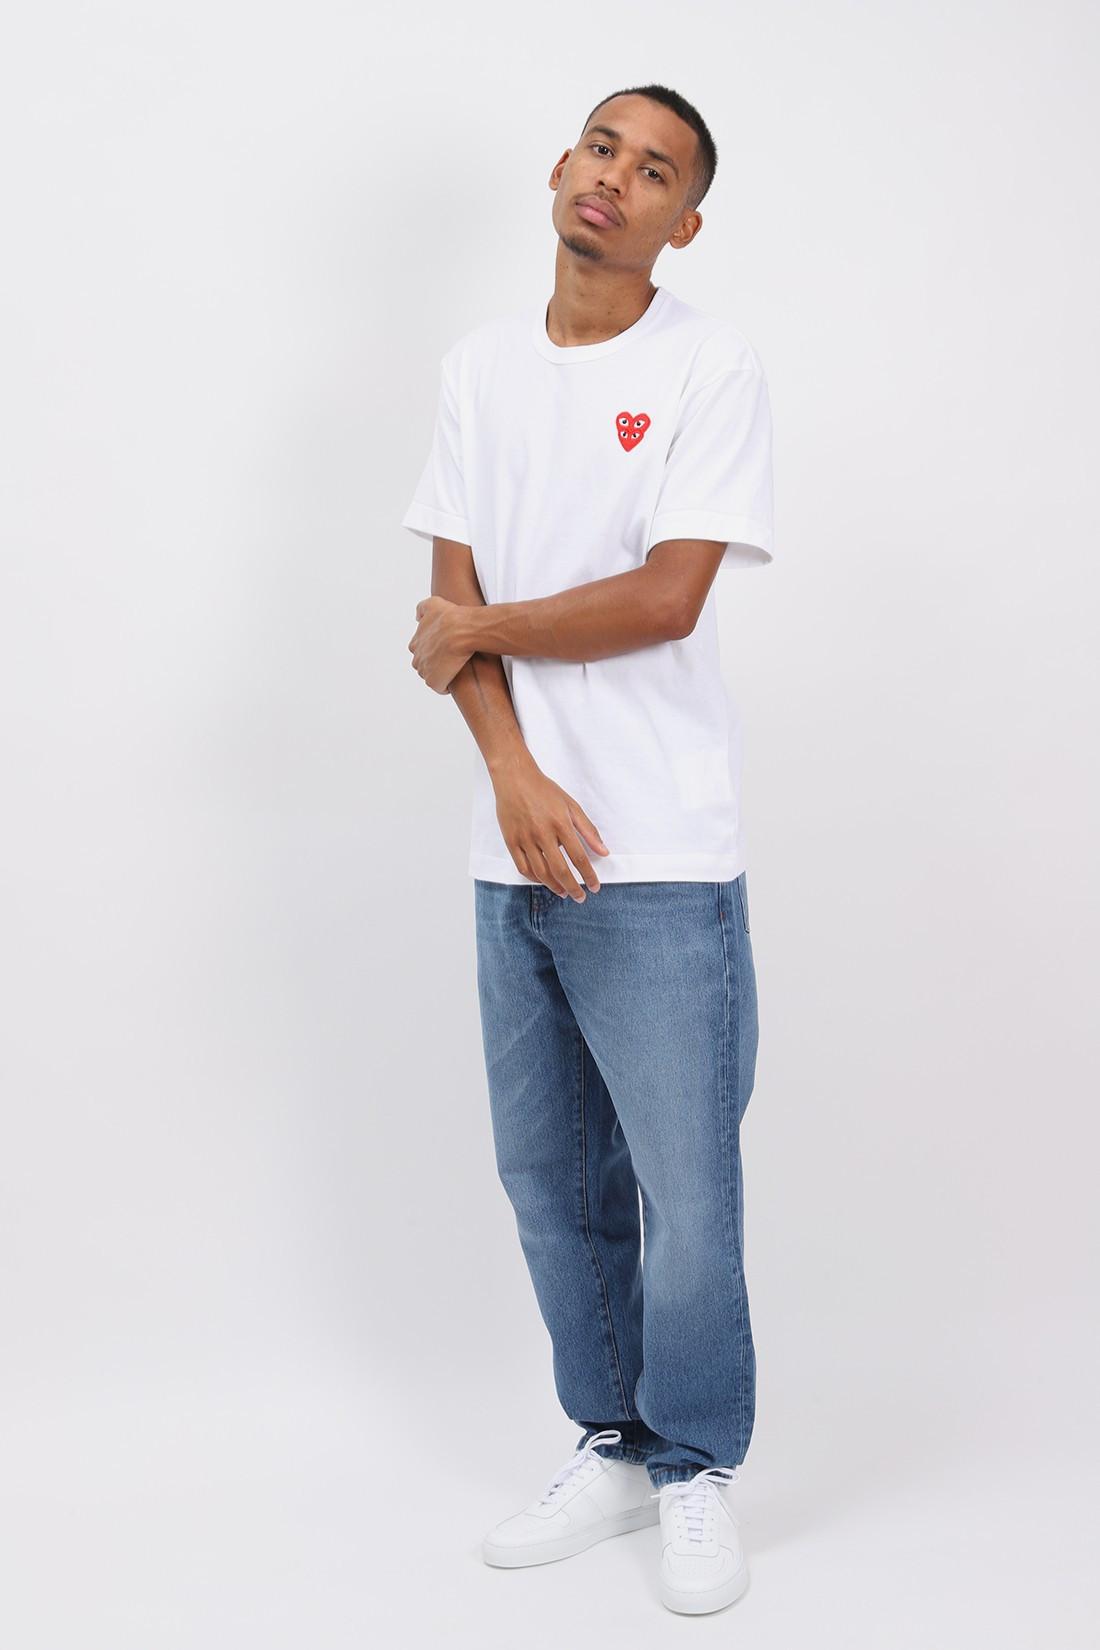 COMME DES GARÇONS PLAY / Double red heart t-shirt White